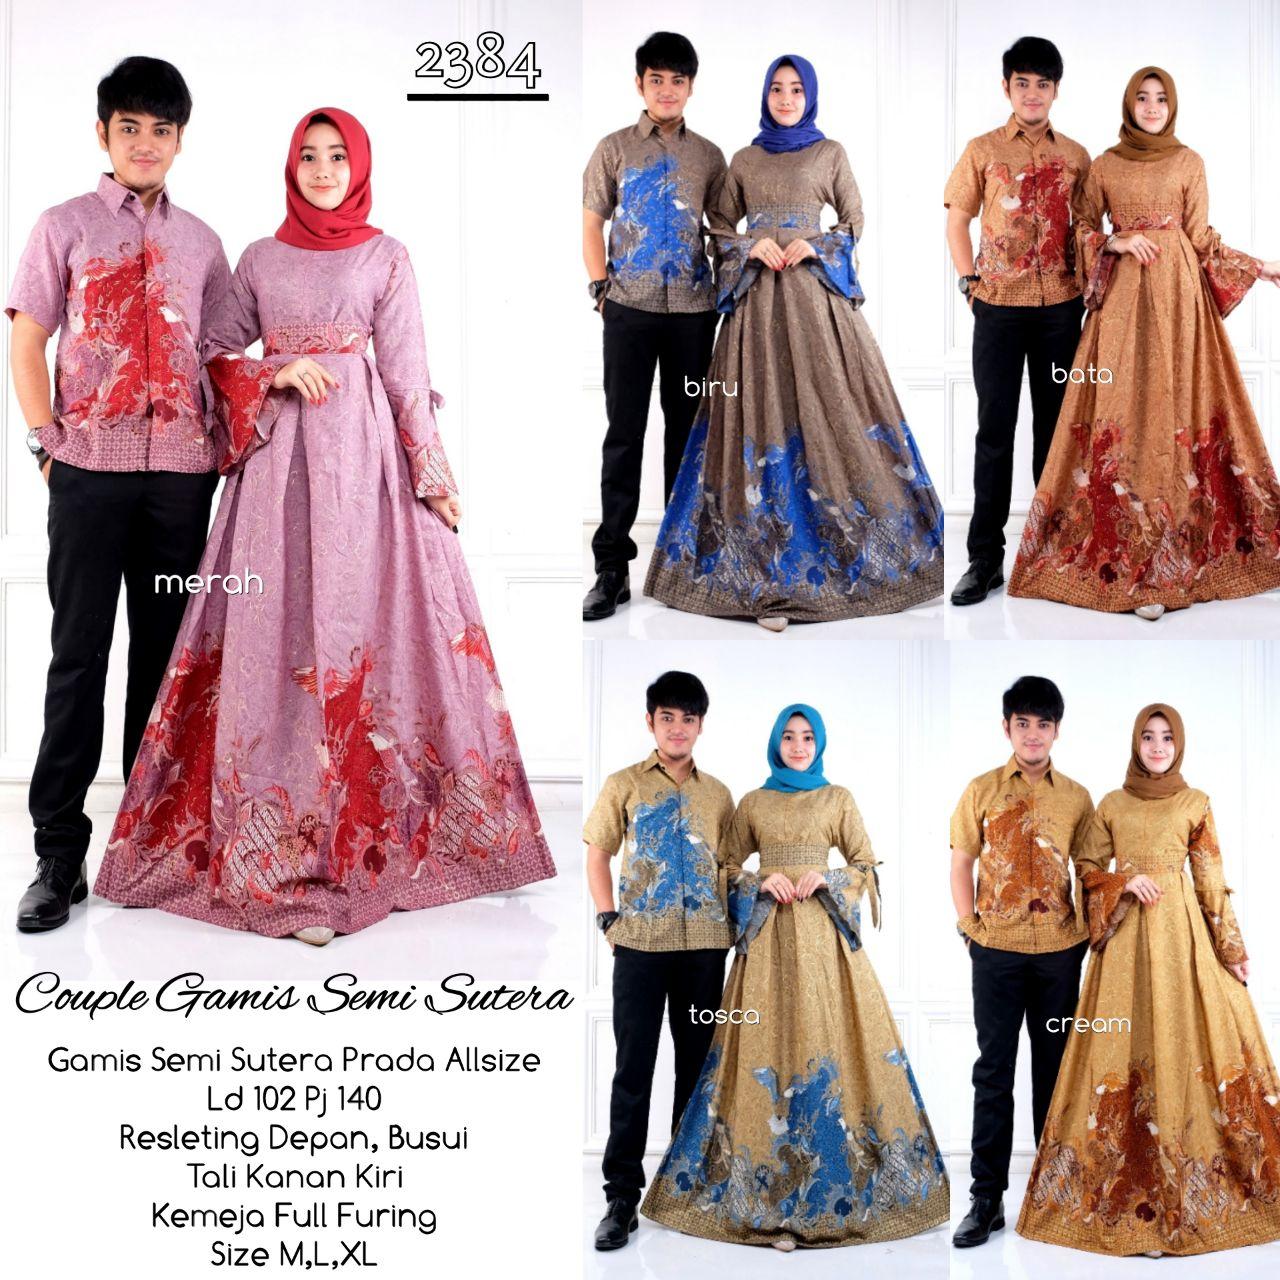 Model Baju Batik Zaskia Mecca: Batik Bagoes Solo